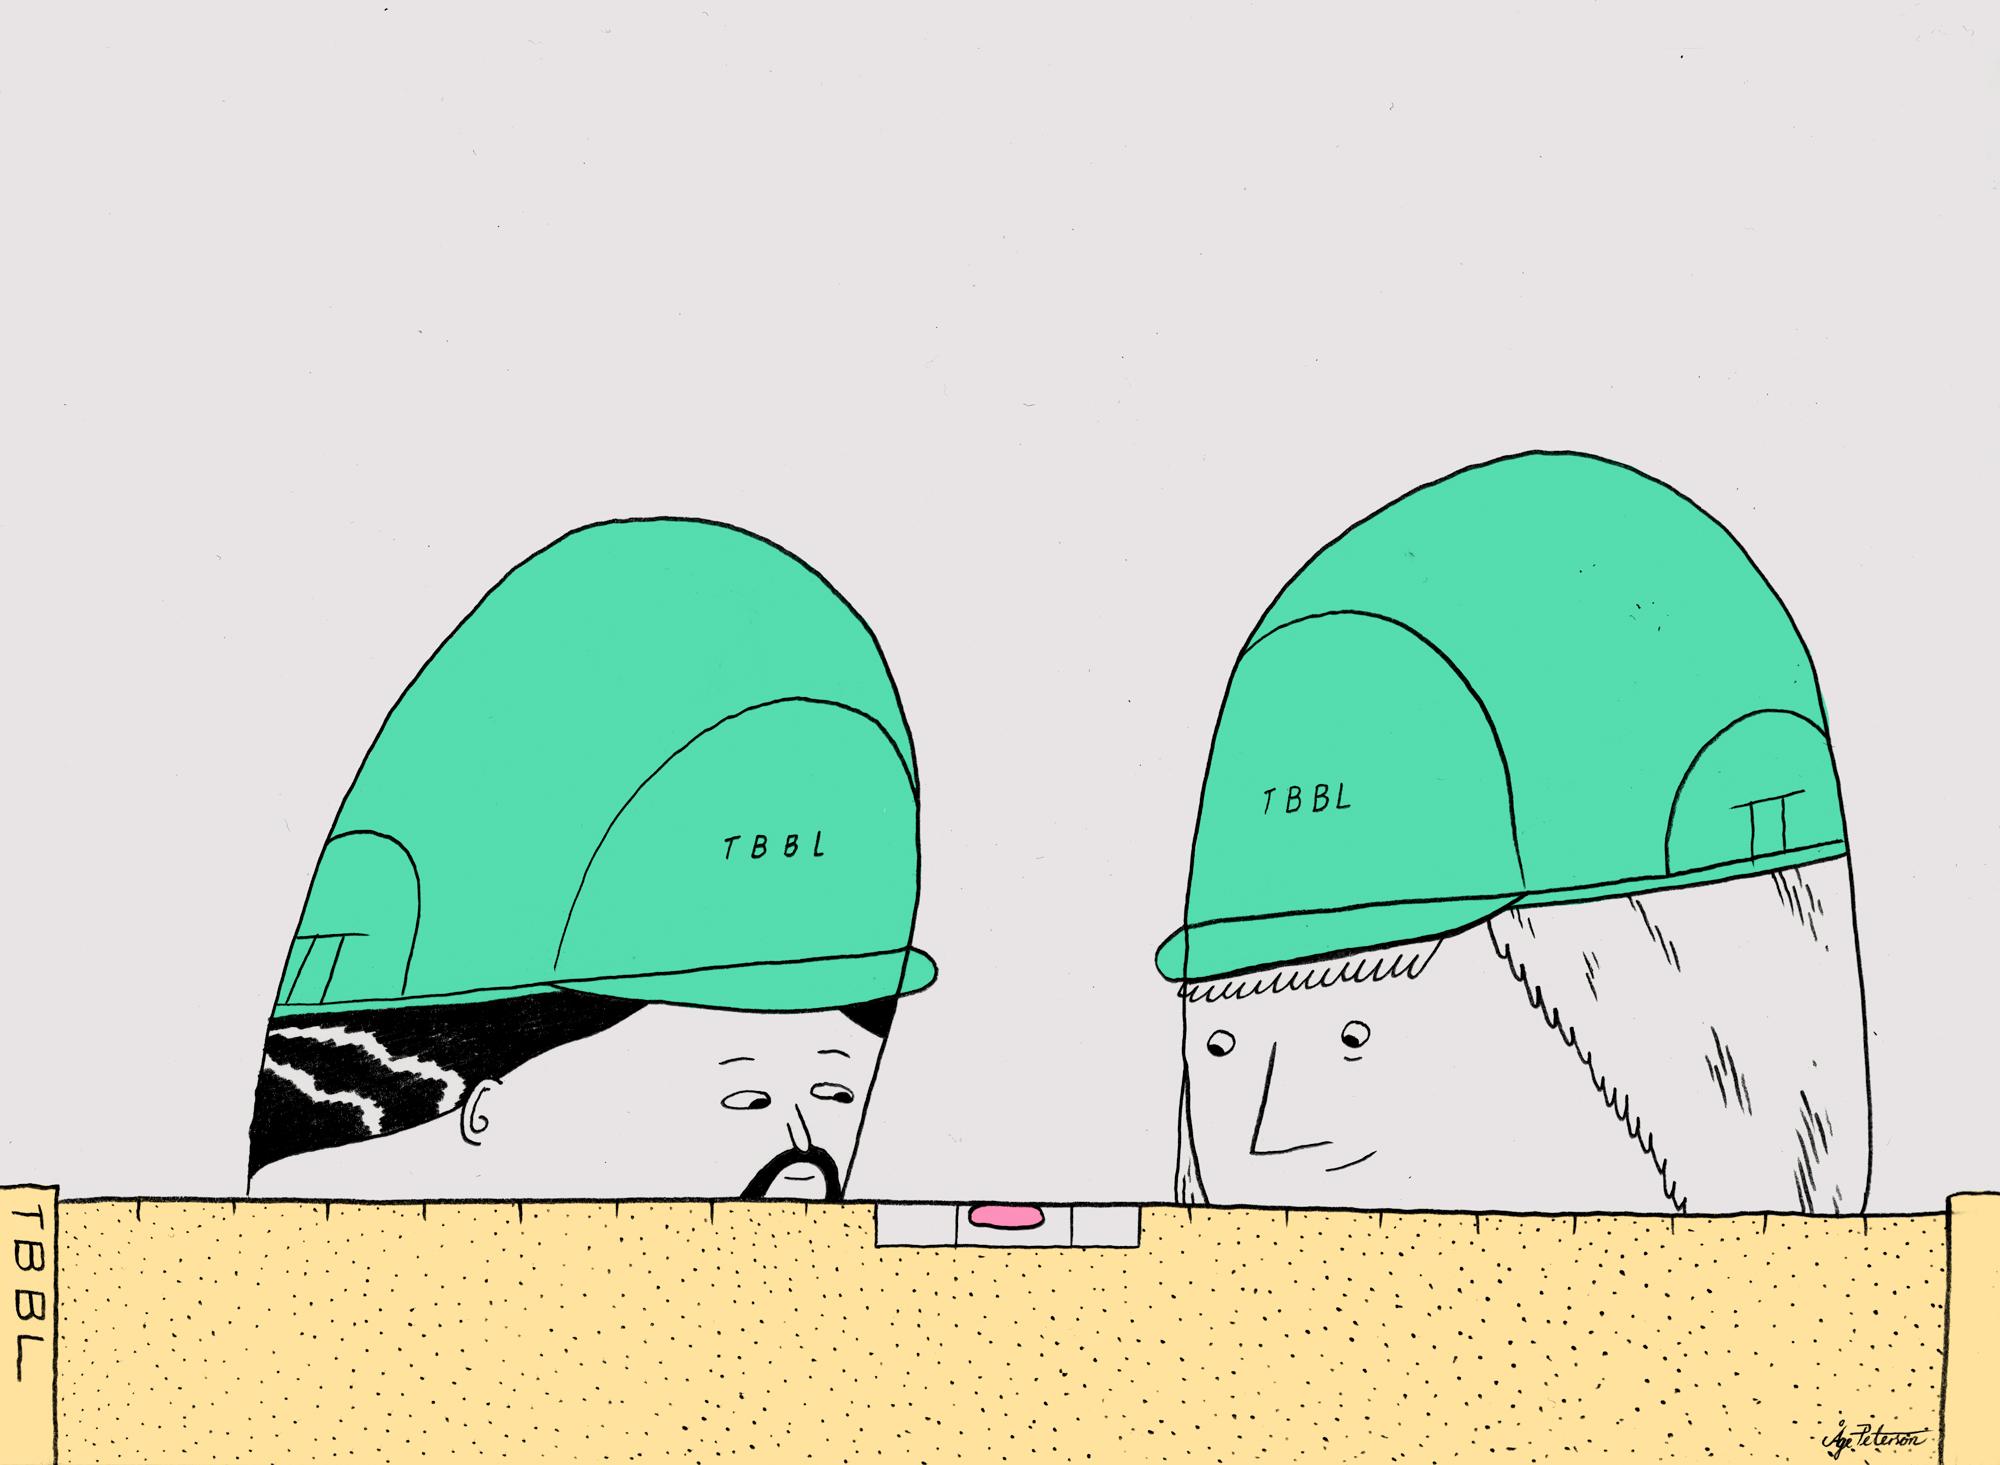 lowres-TBBL-illustrasjon-3-Åge-Peterson.jpg